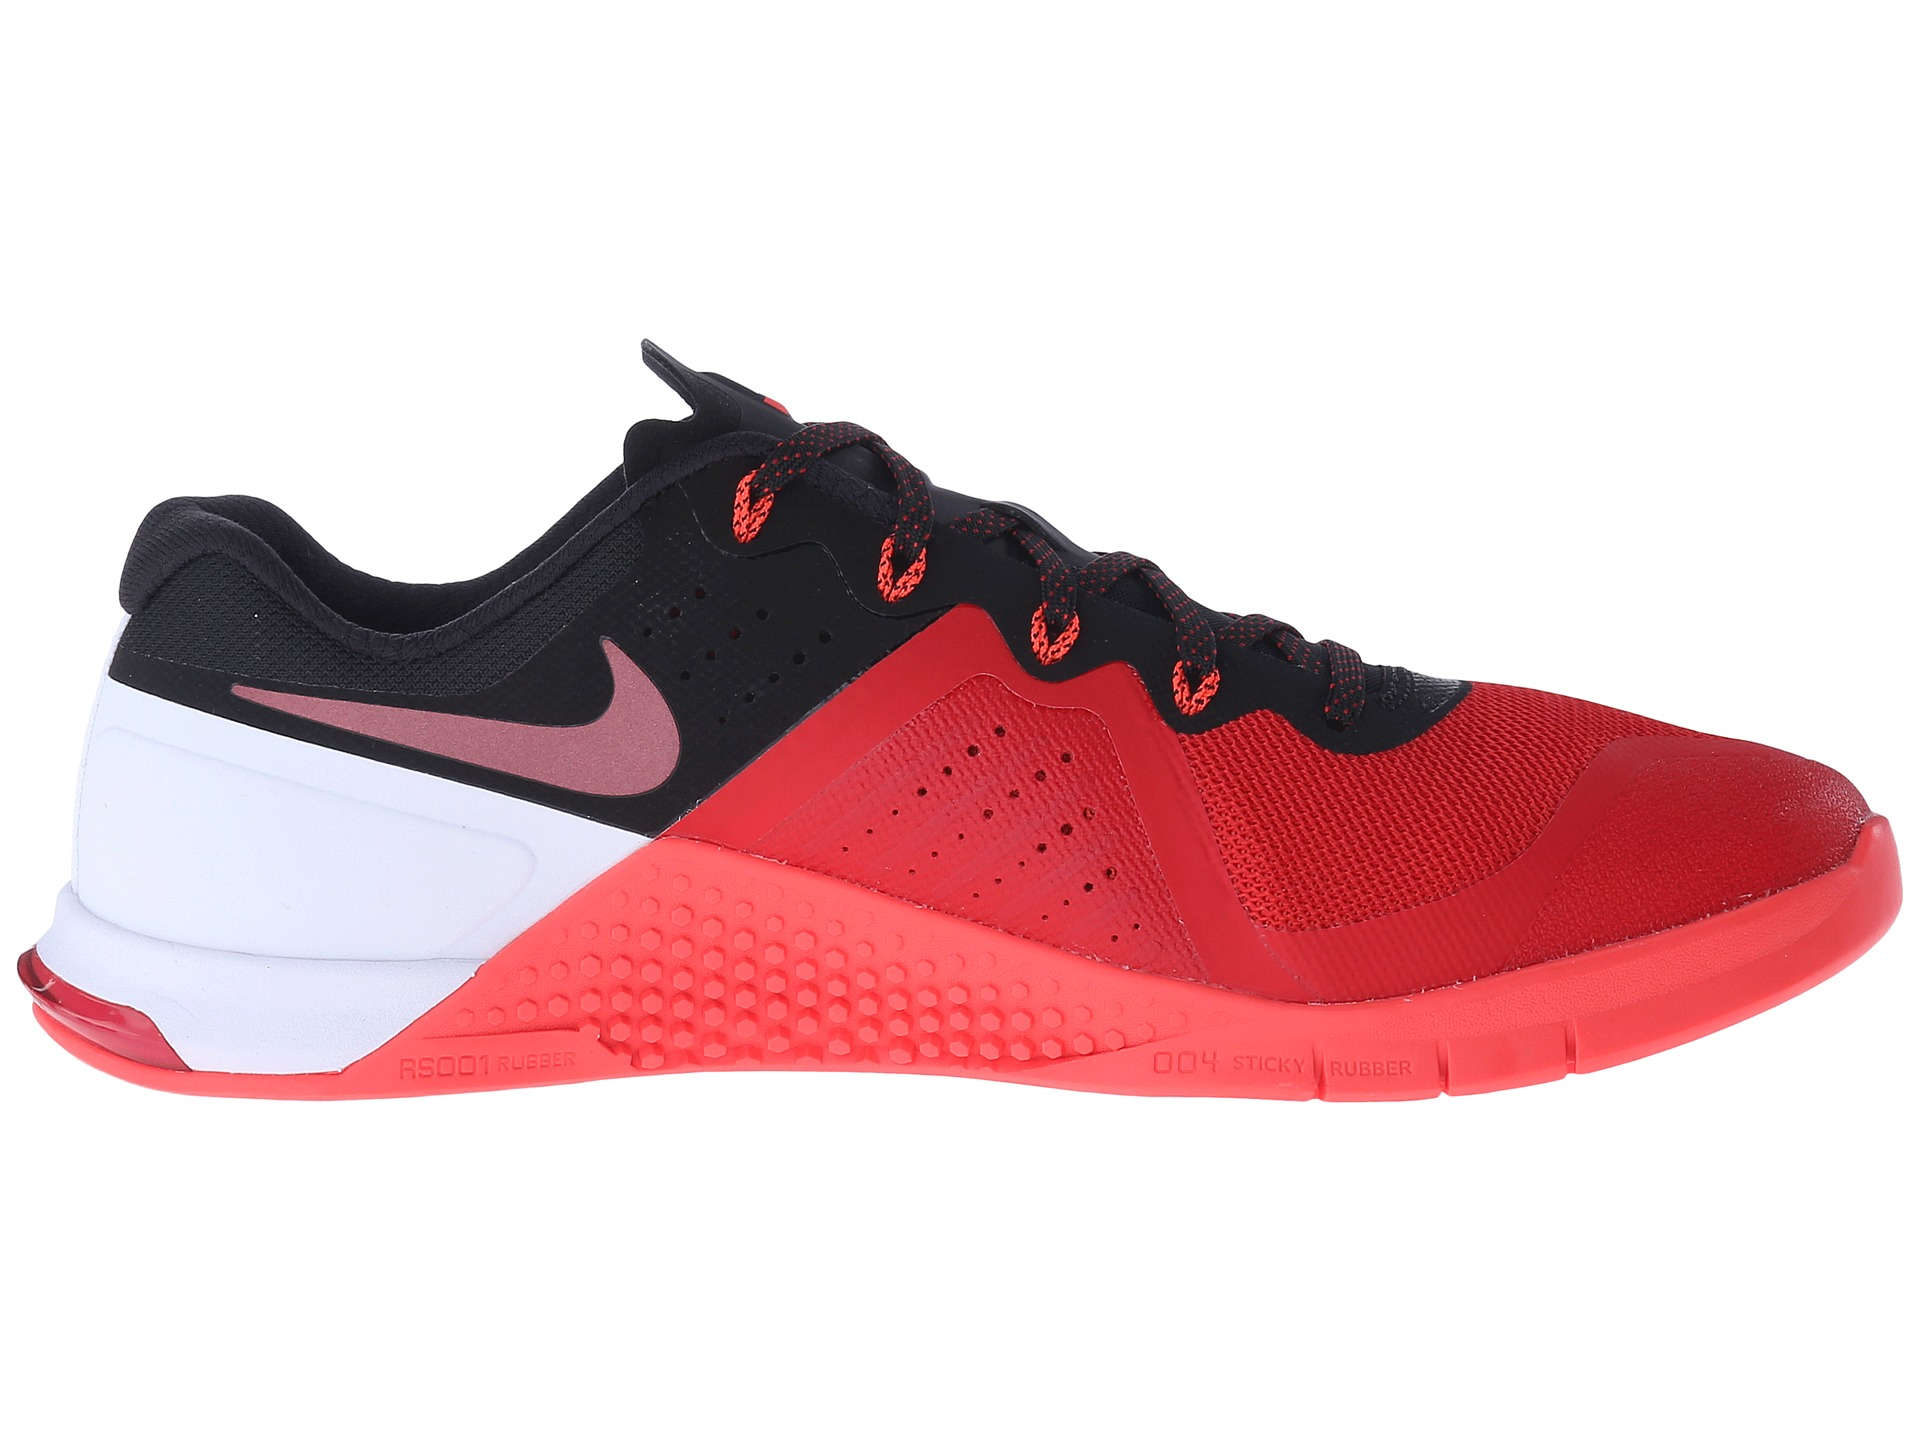 3e18e9a8ca35 Lyst - Nike Metcon 2 in Red for Men